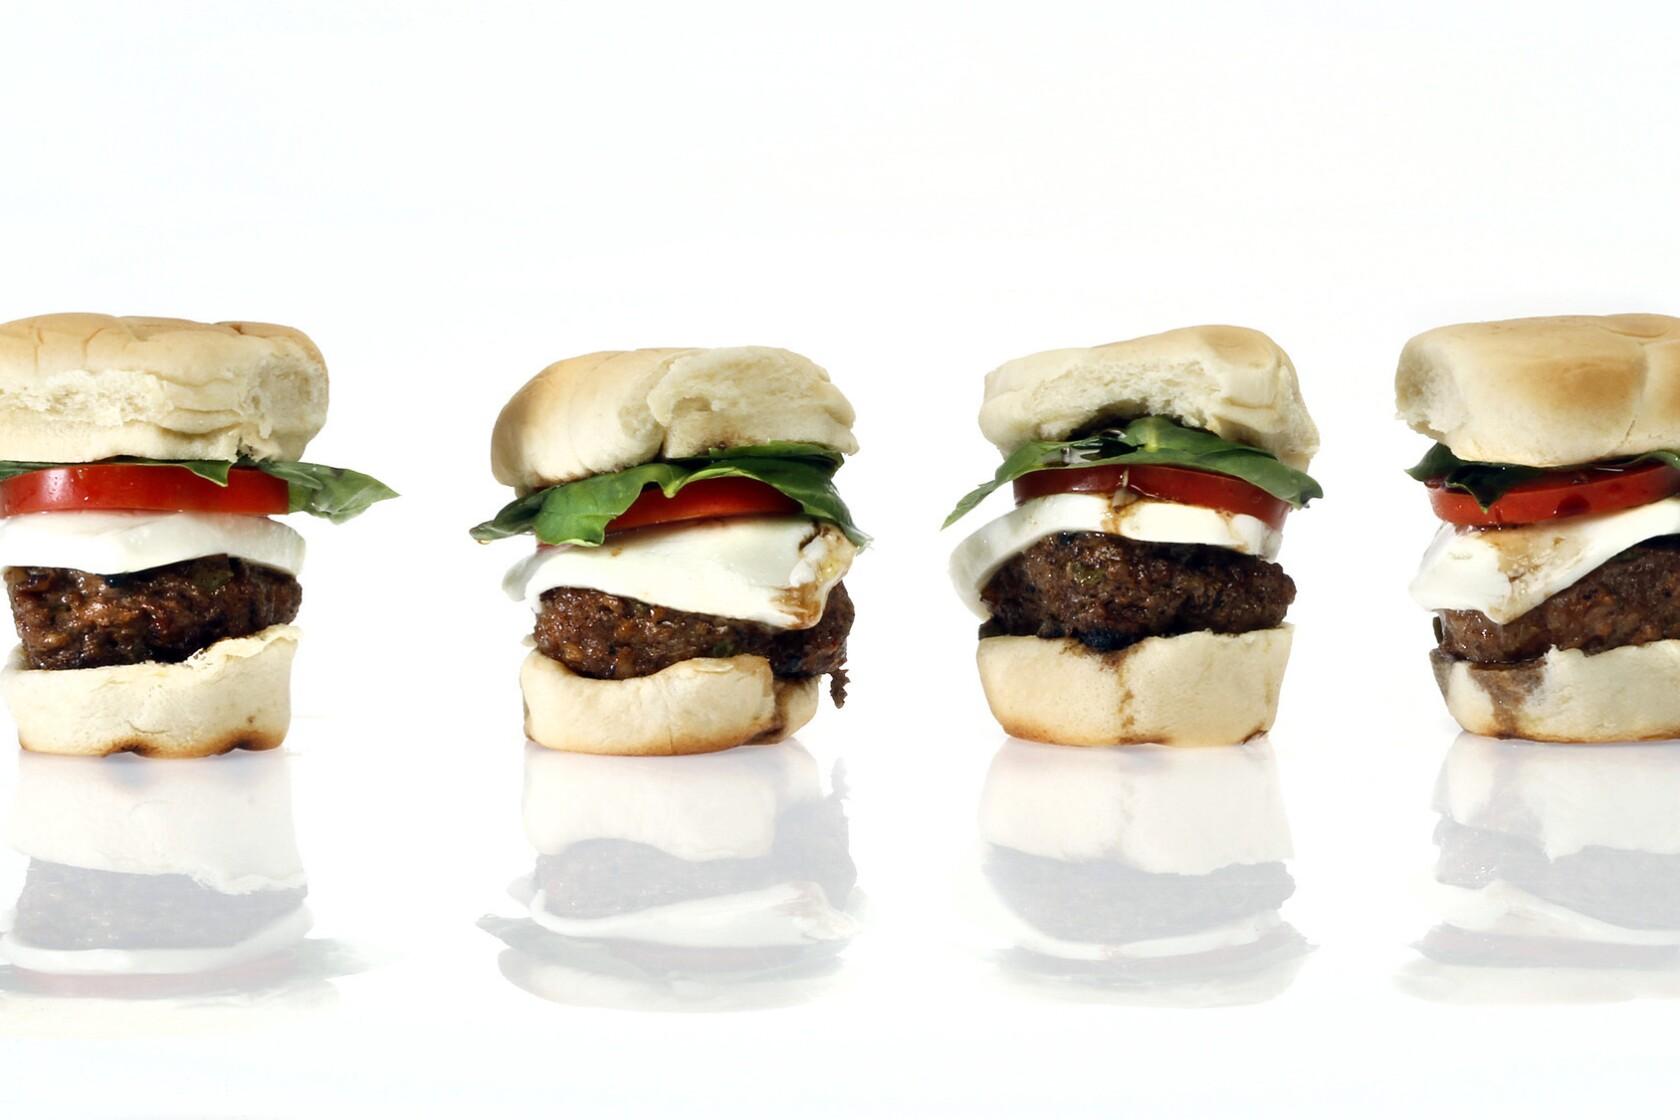 18 great hamburger recipes - Los Angeles Times